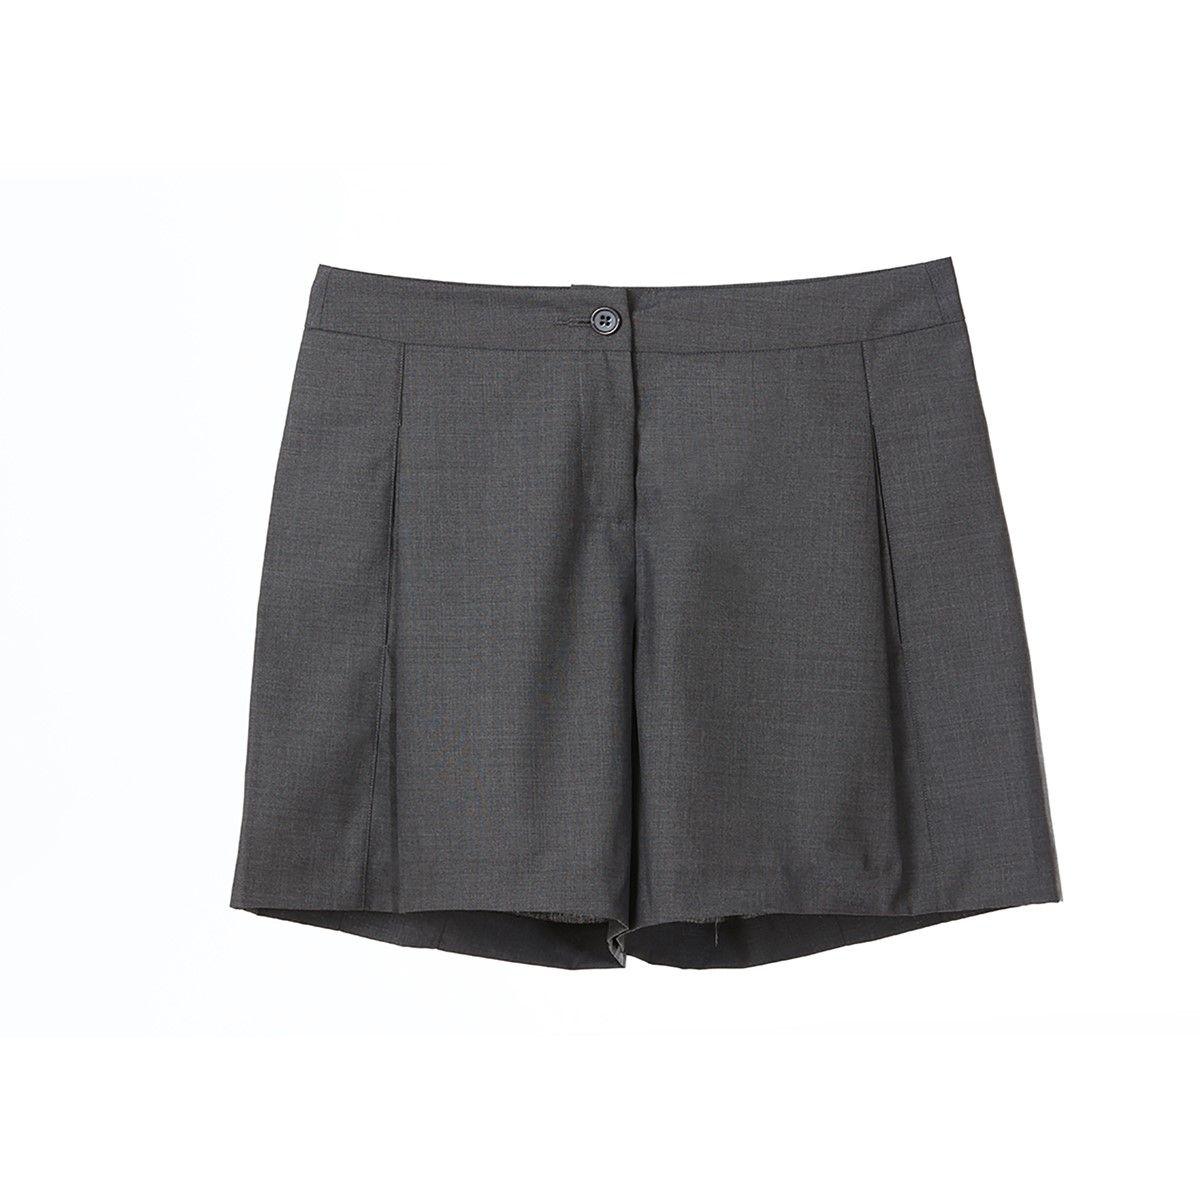 Short gris style Angleterre bcbg stylé classic chic ideal pour l hiver